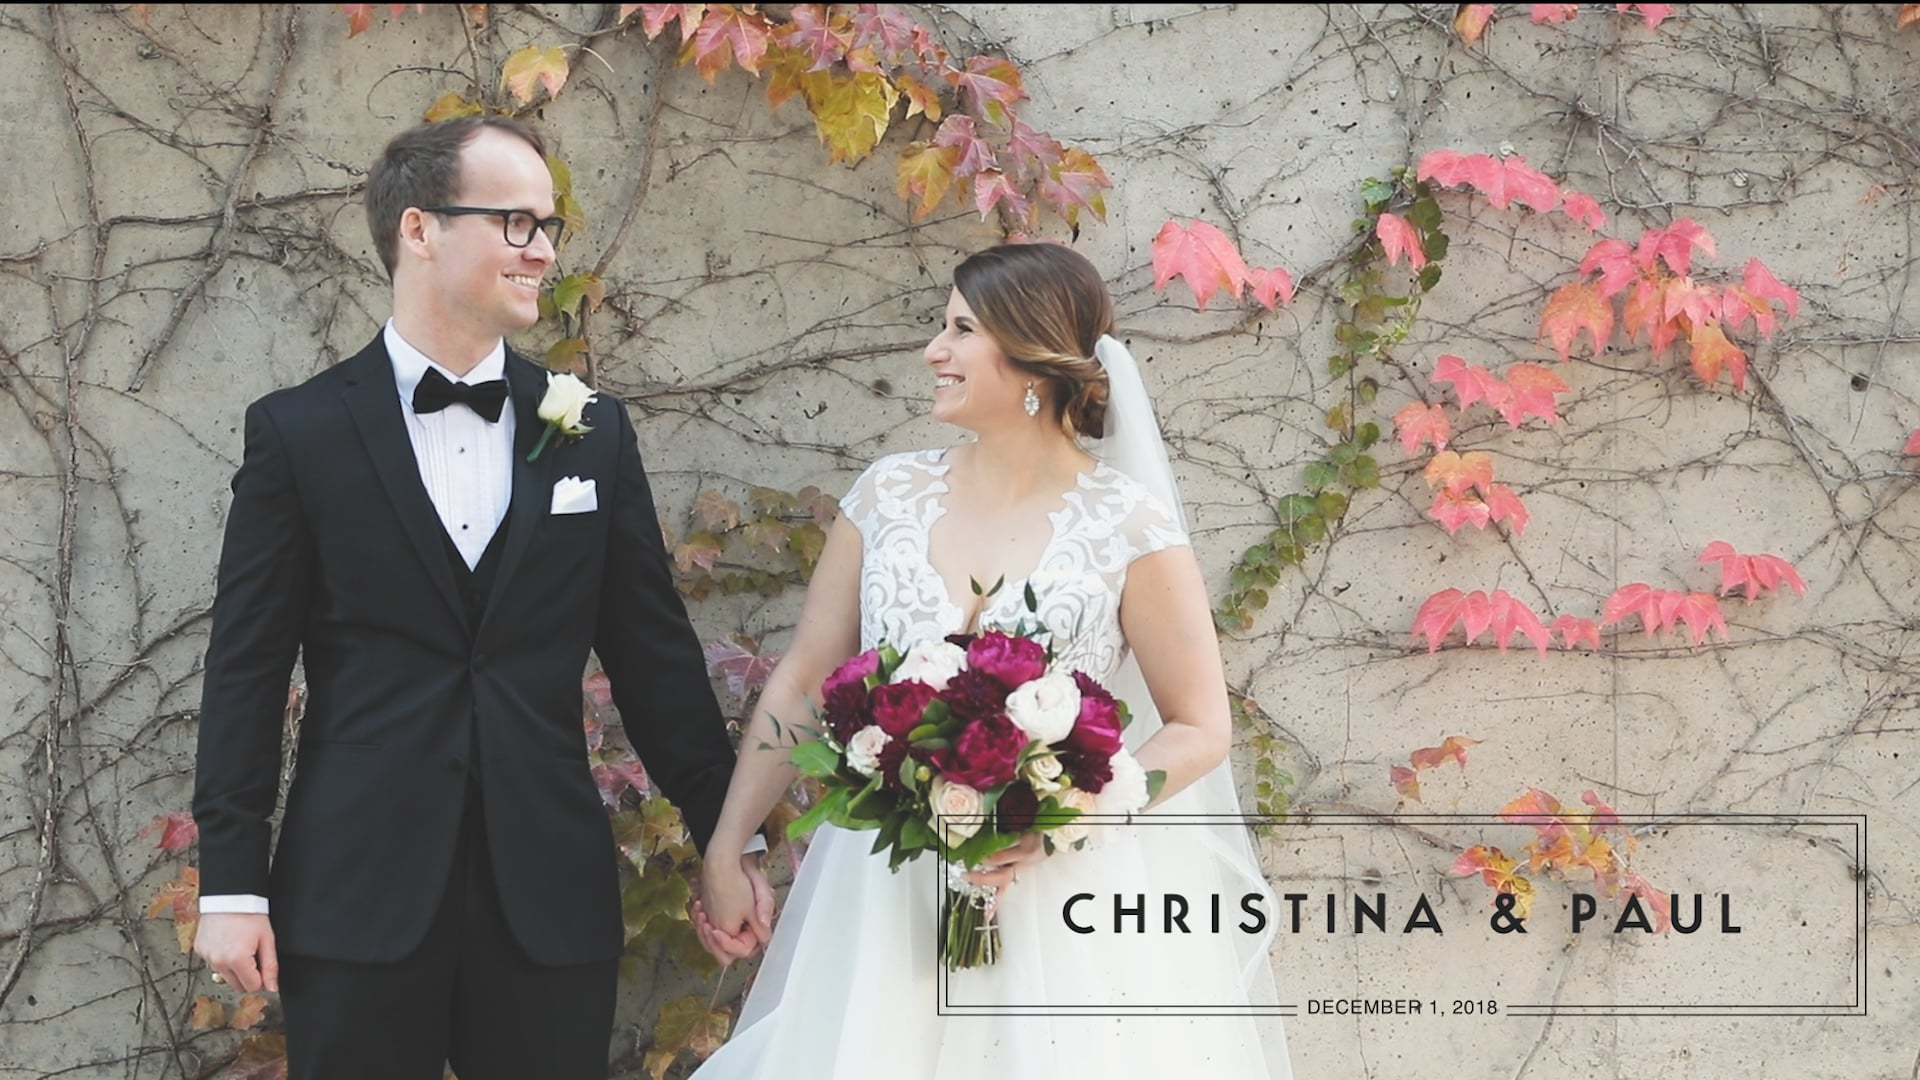 Christina & Paul's Wedding Film